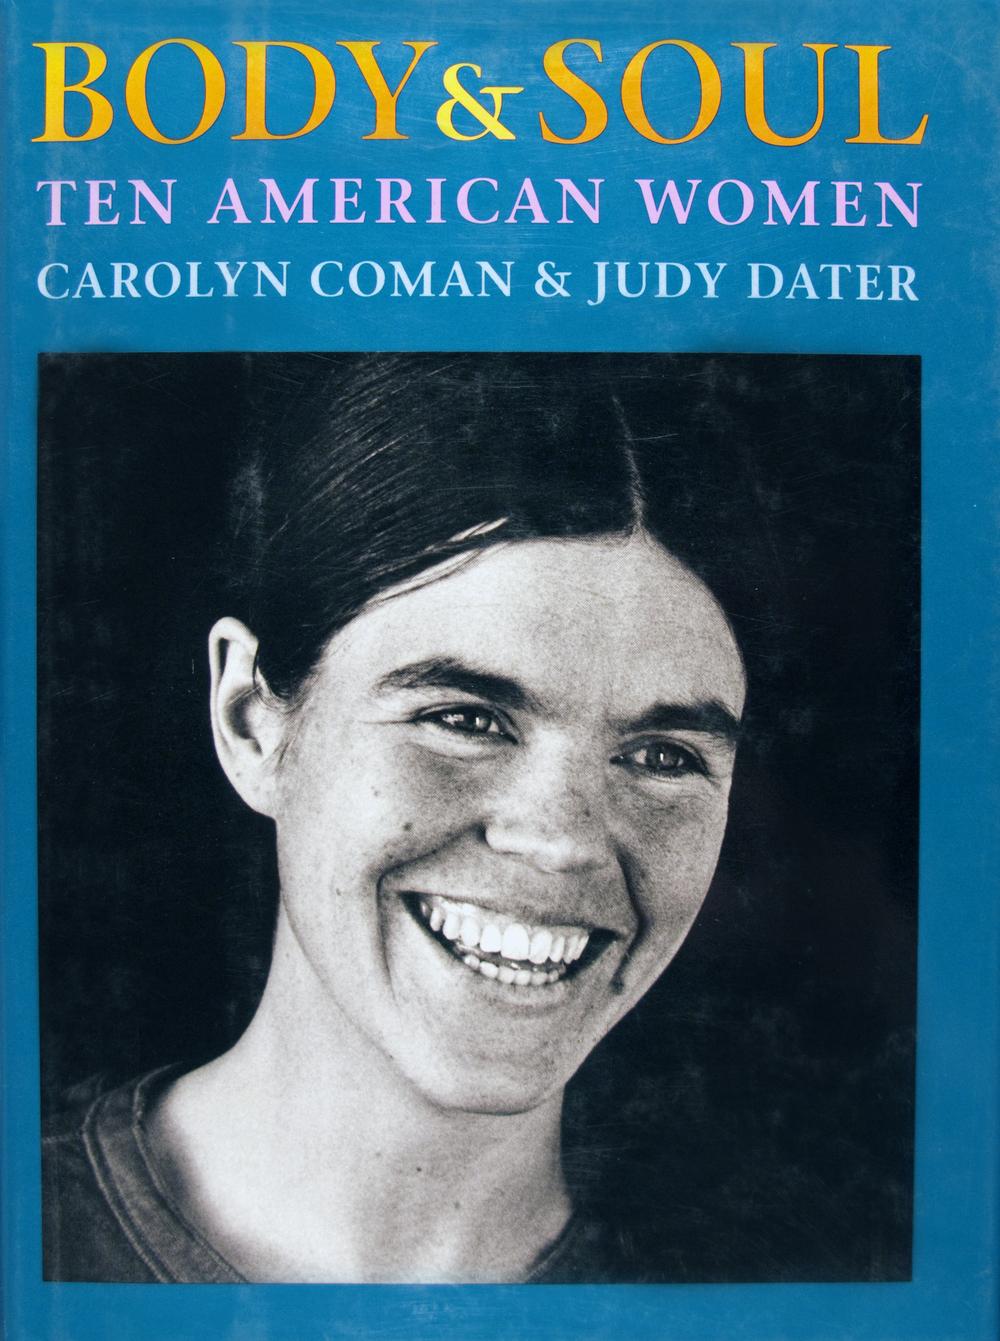 Body and Soul: Ten American Women, 1988